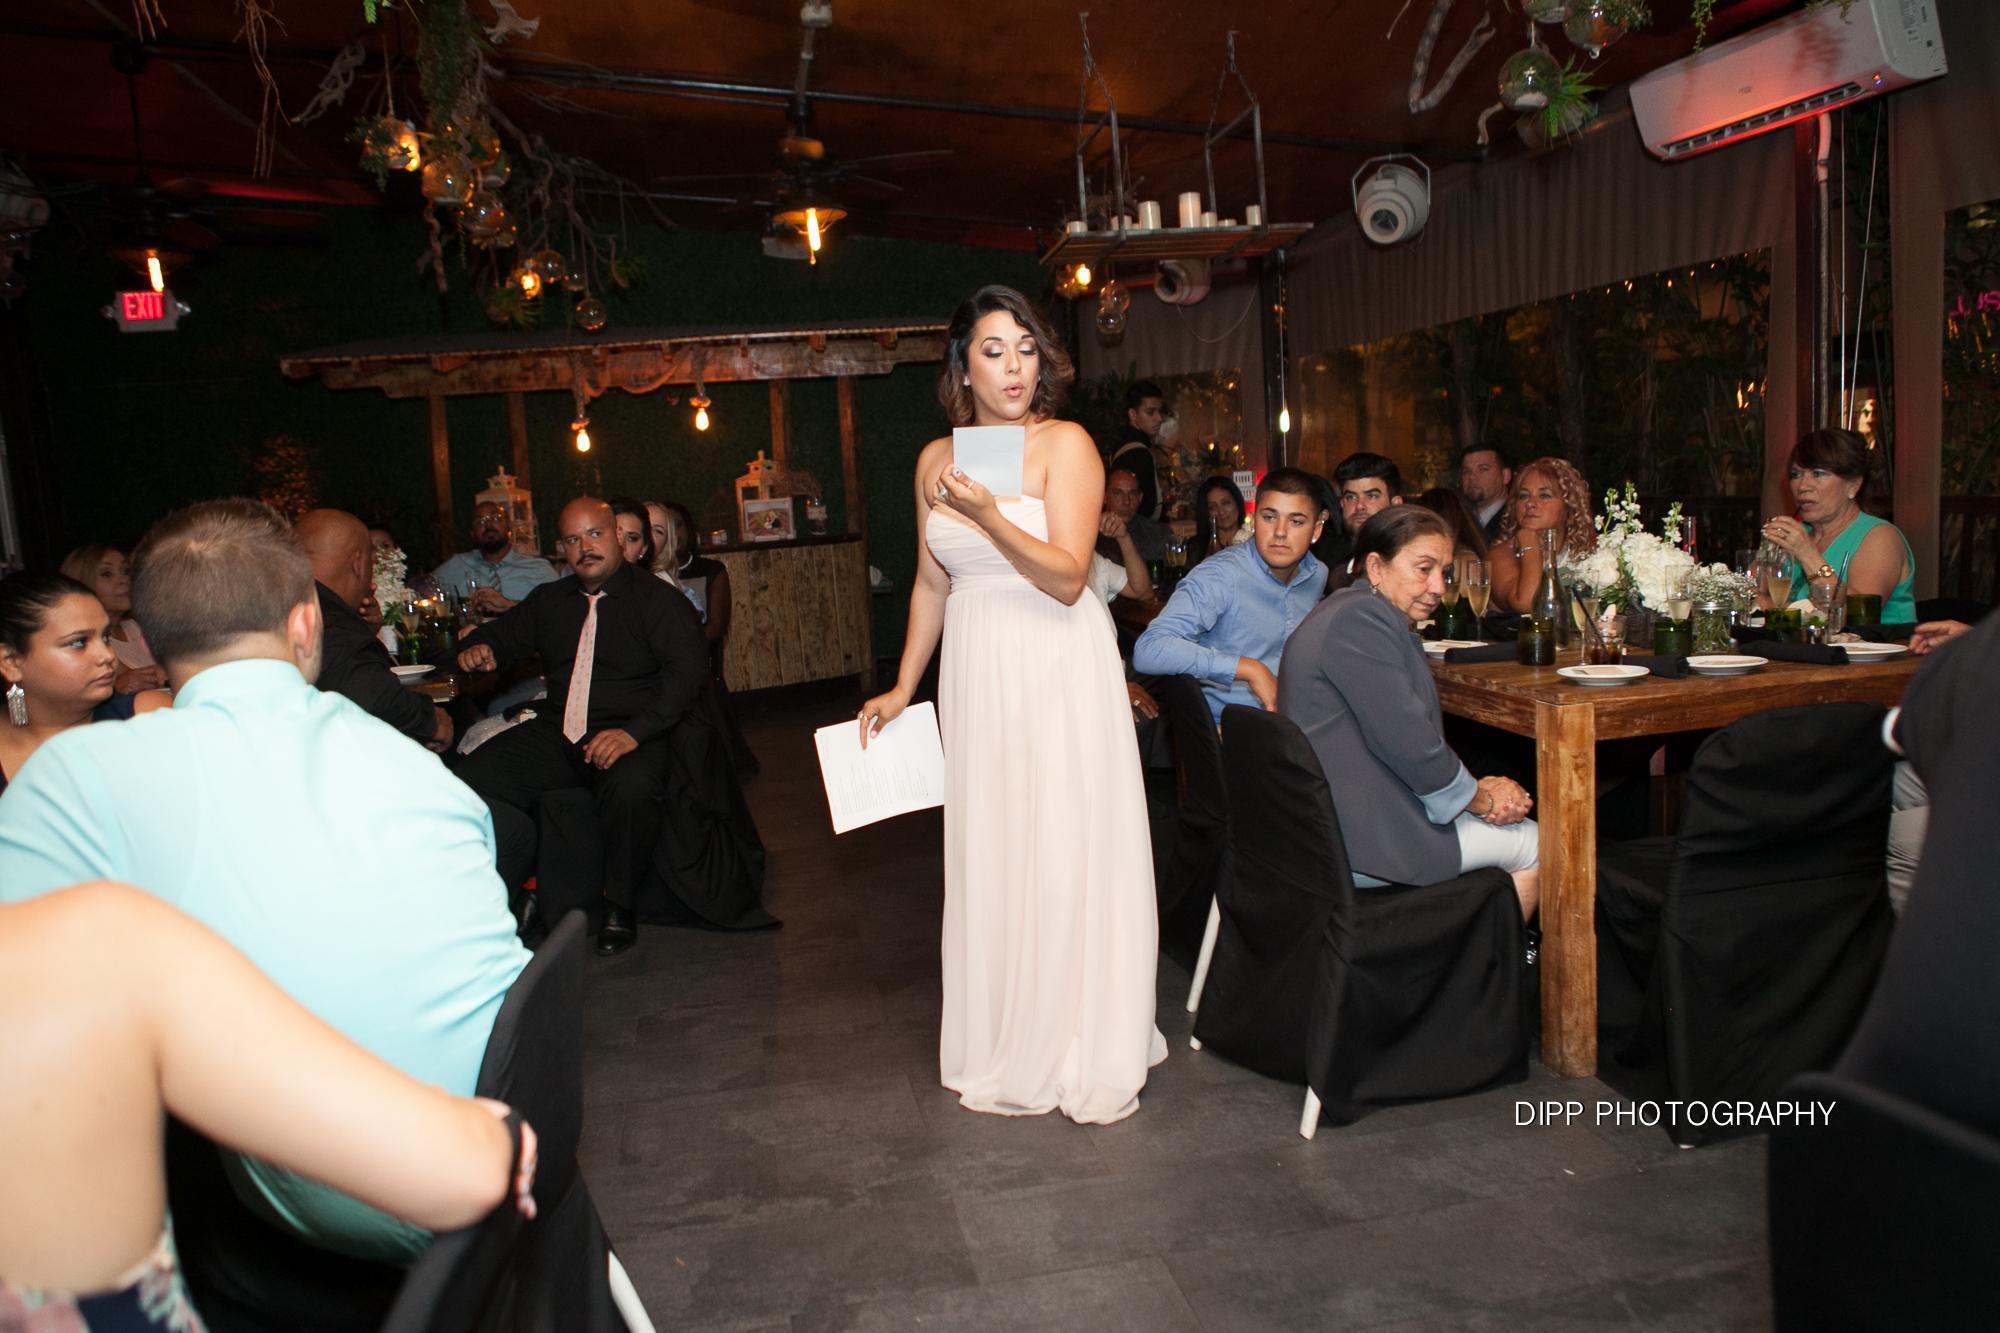 Dipp_2016 EDITED Melissa & Avilio Wedding-493